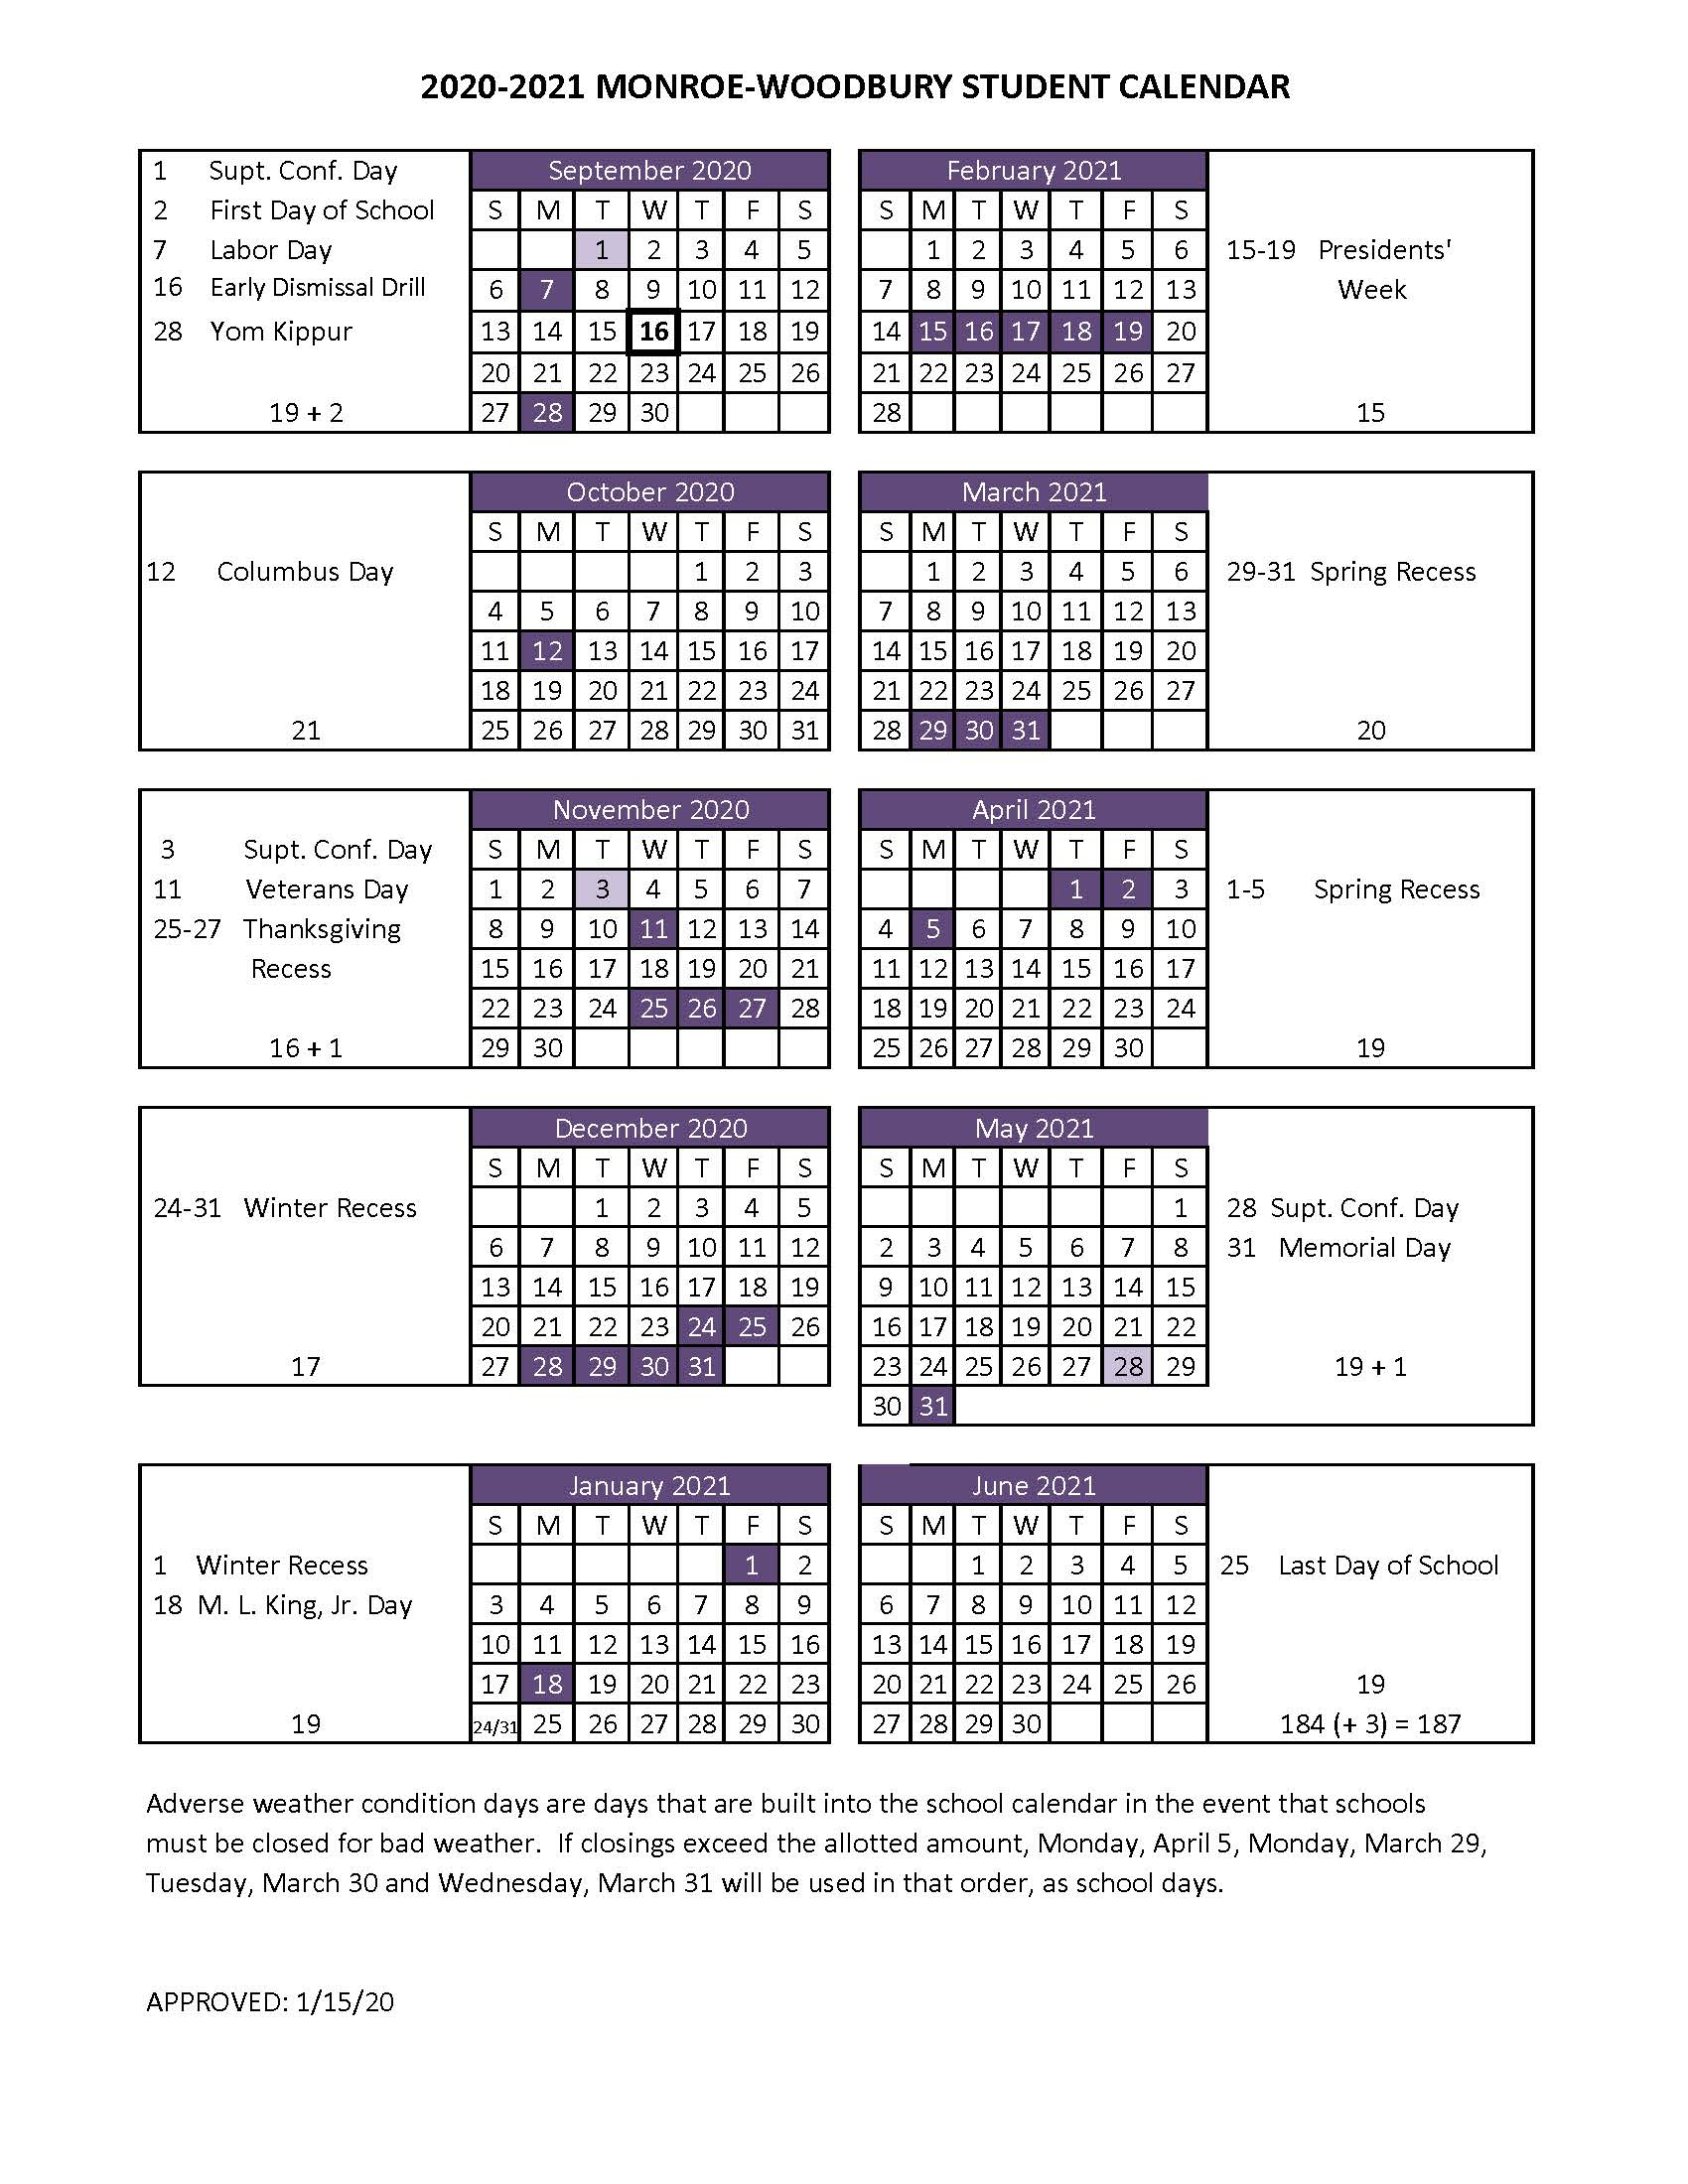 Boe Adopts 2020 2021 Student Calendar - Monroe Woodbury In Jersey City Public School Calendar 2021 2020